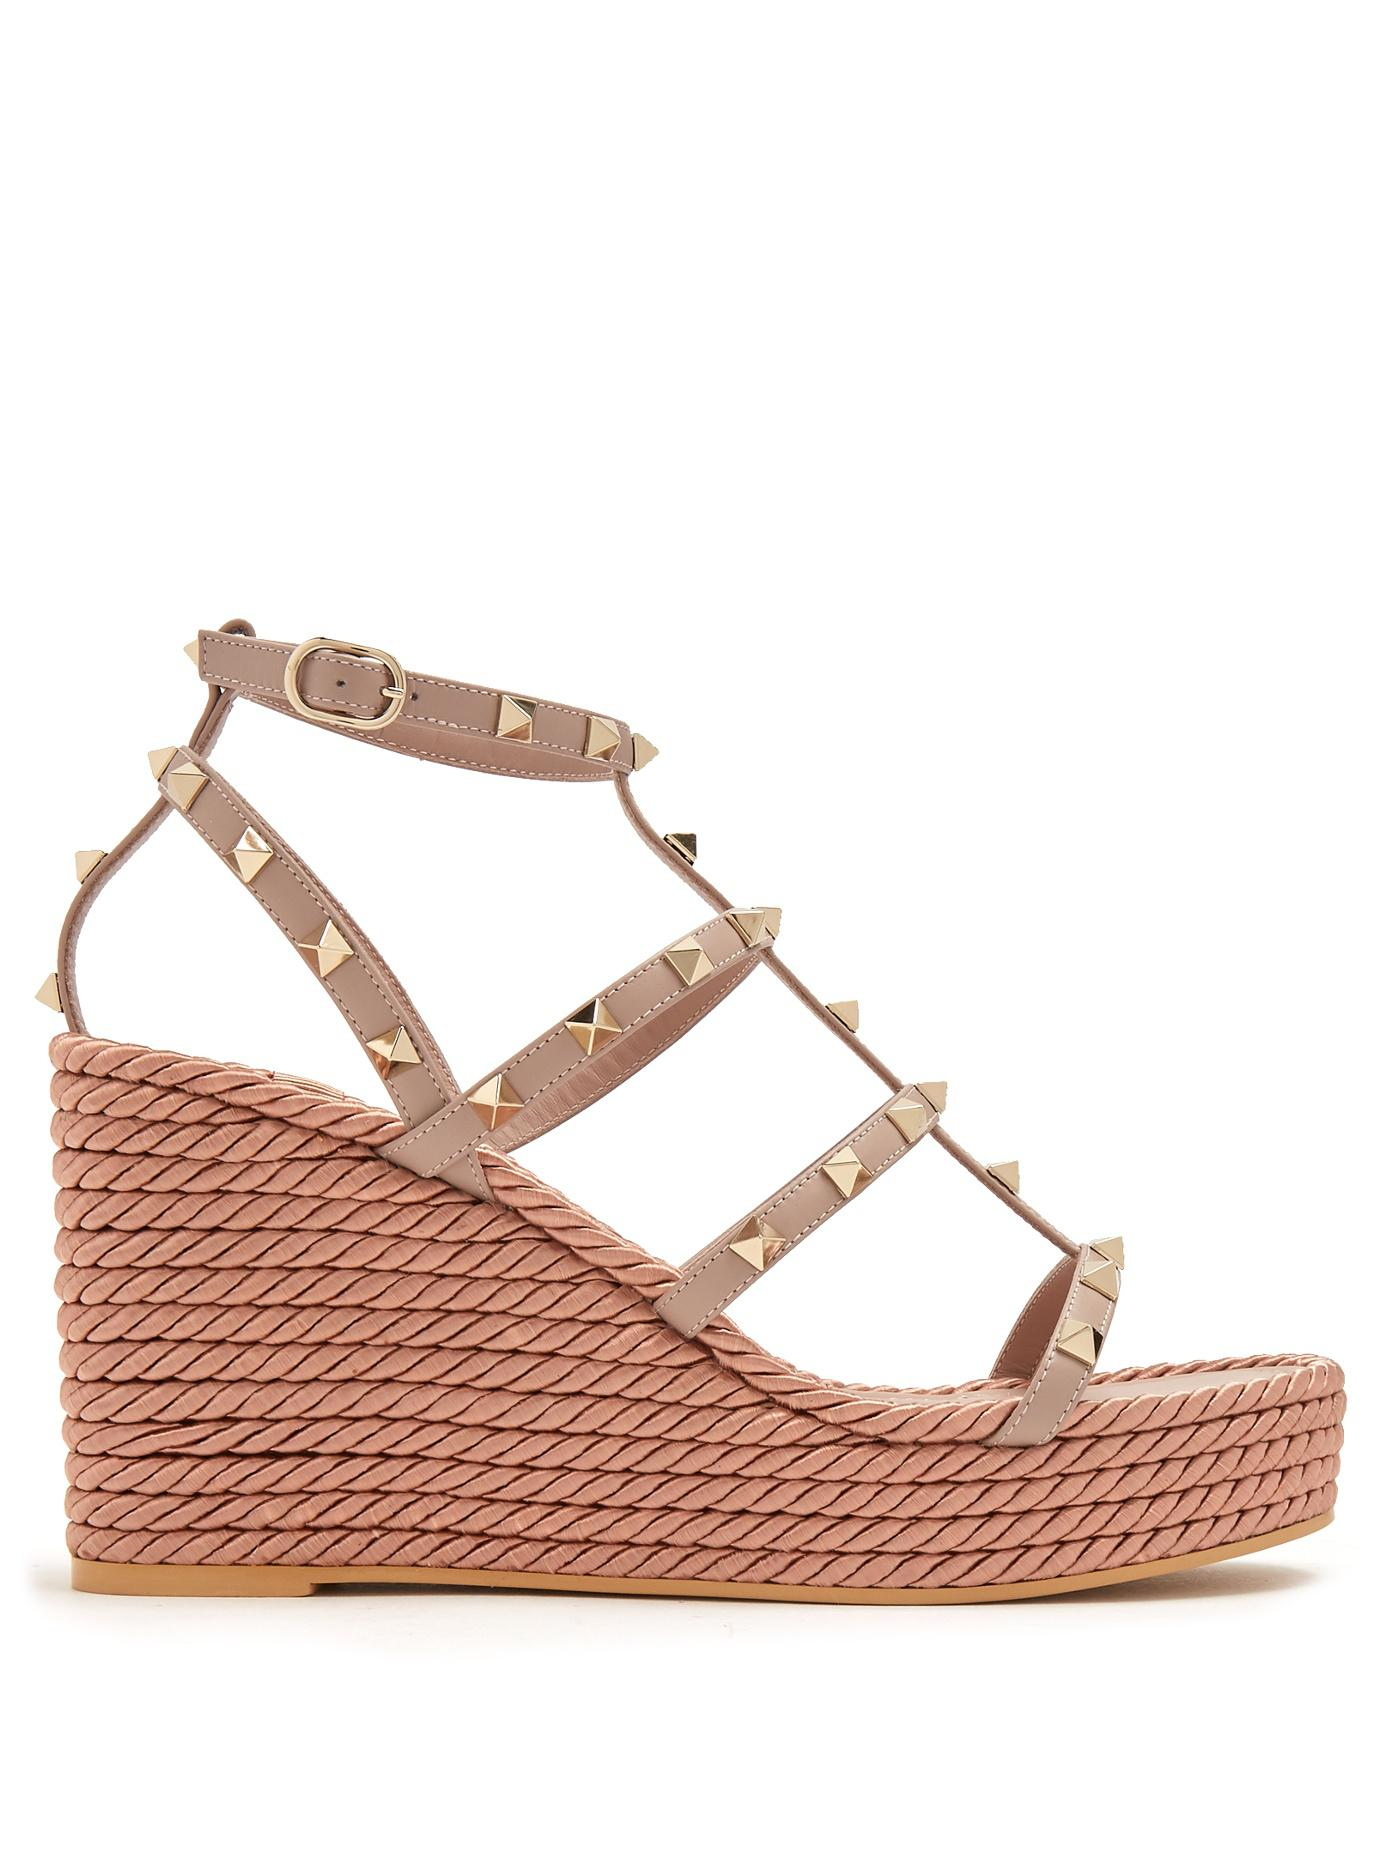 8e9d9f4109ba Valentino Torchon Rockstud Leather Wedge Sandals - Lyst